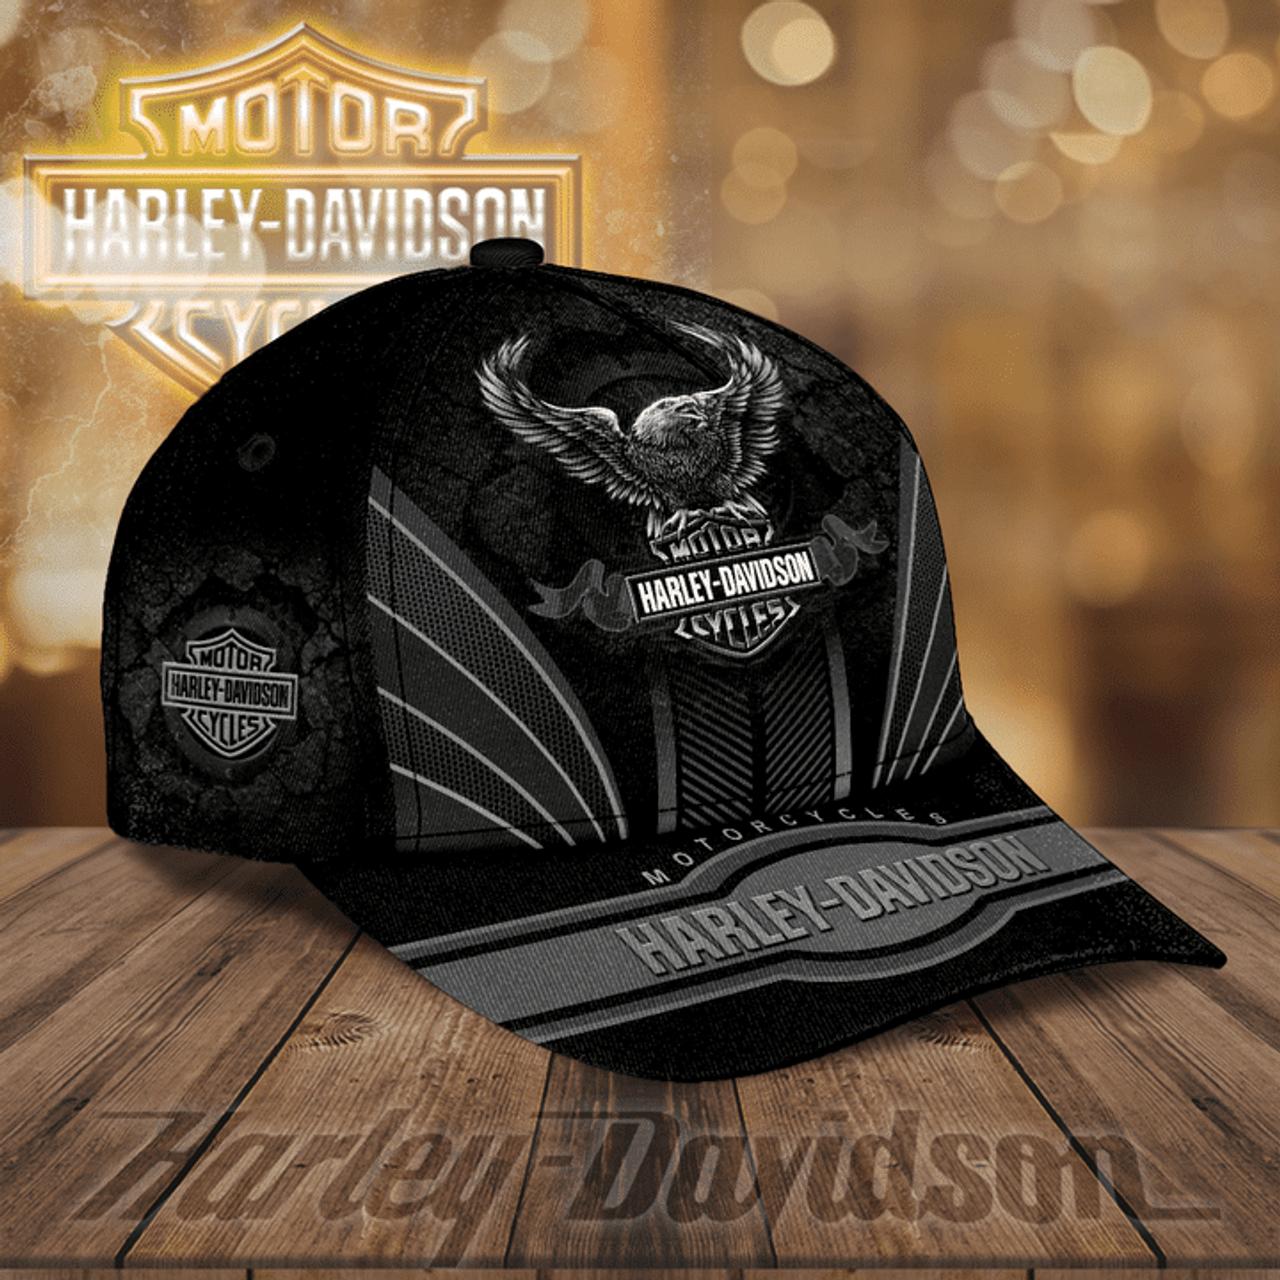 OFFICIAL-HARLEY-DAVIDSON-MOTORCYCLE-BIKER-HATS/CUSTOM-3D-PRINTED-HARLEY-EAGLE!!